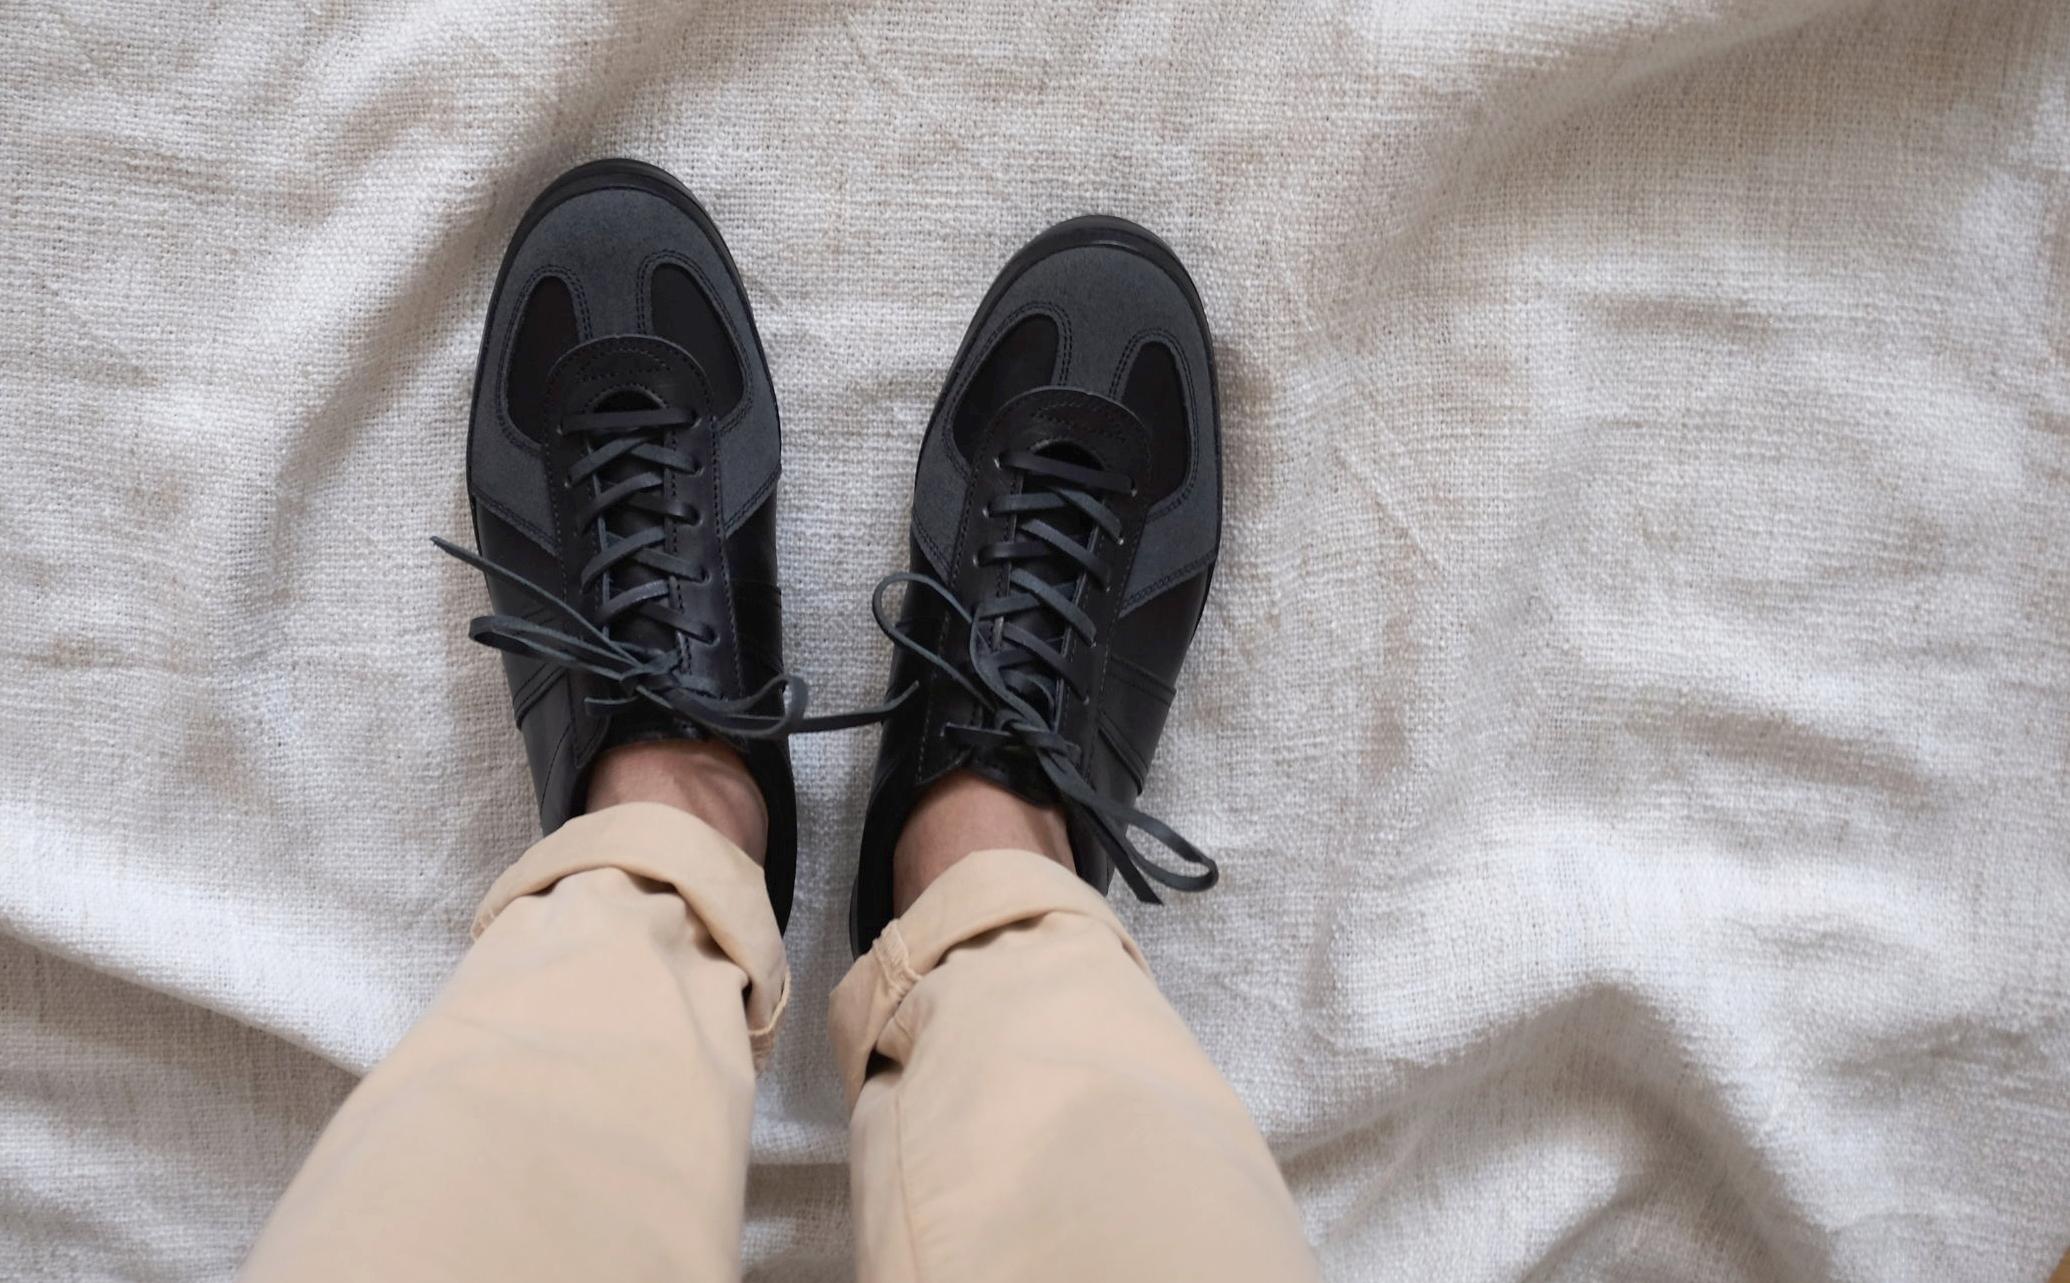 Henderscheme Mp-05 Hender Scheme Mr Gumbatron sneakers artisan Ryo Kashiwazaki Mrgumbatron